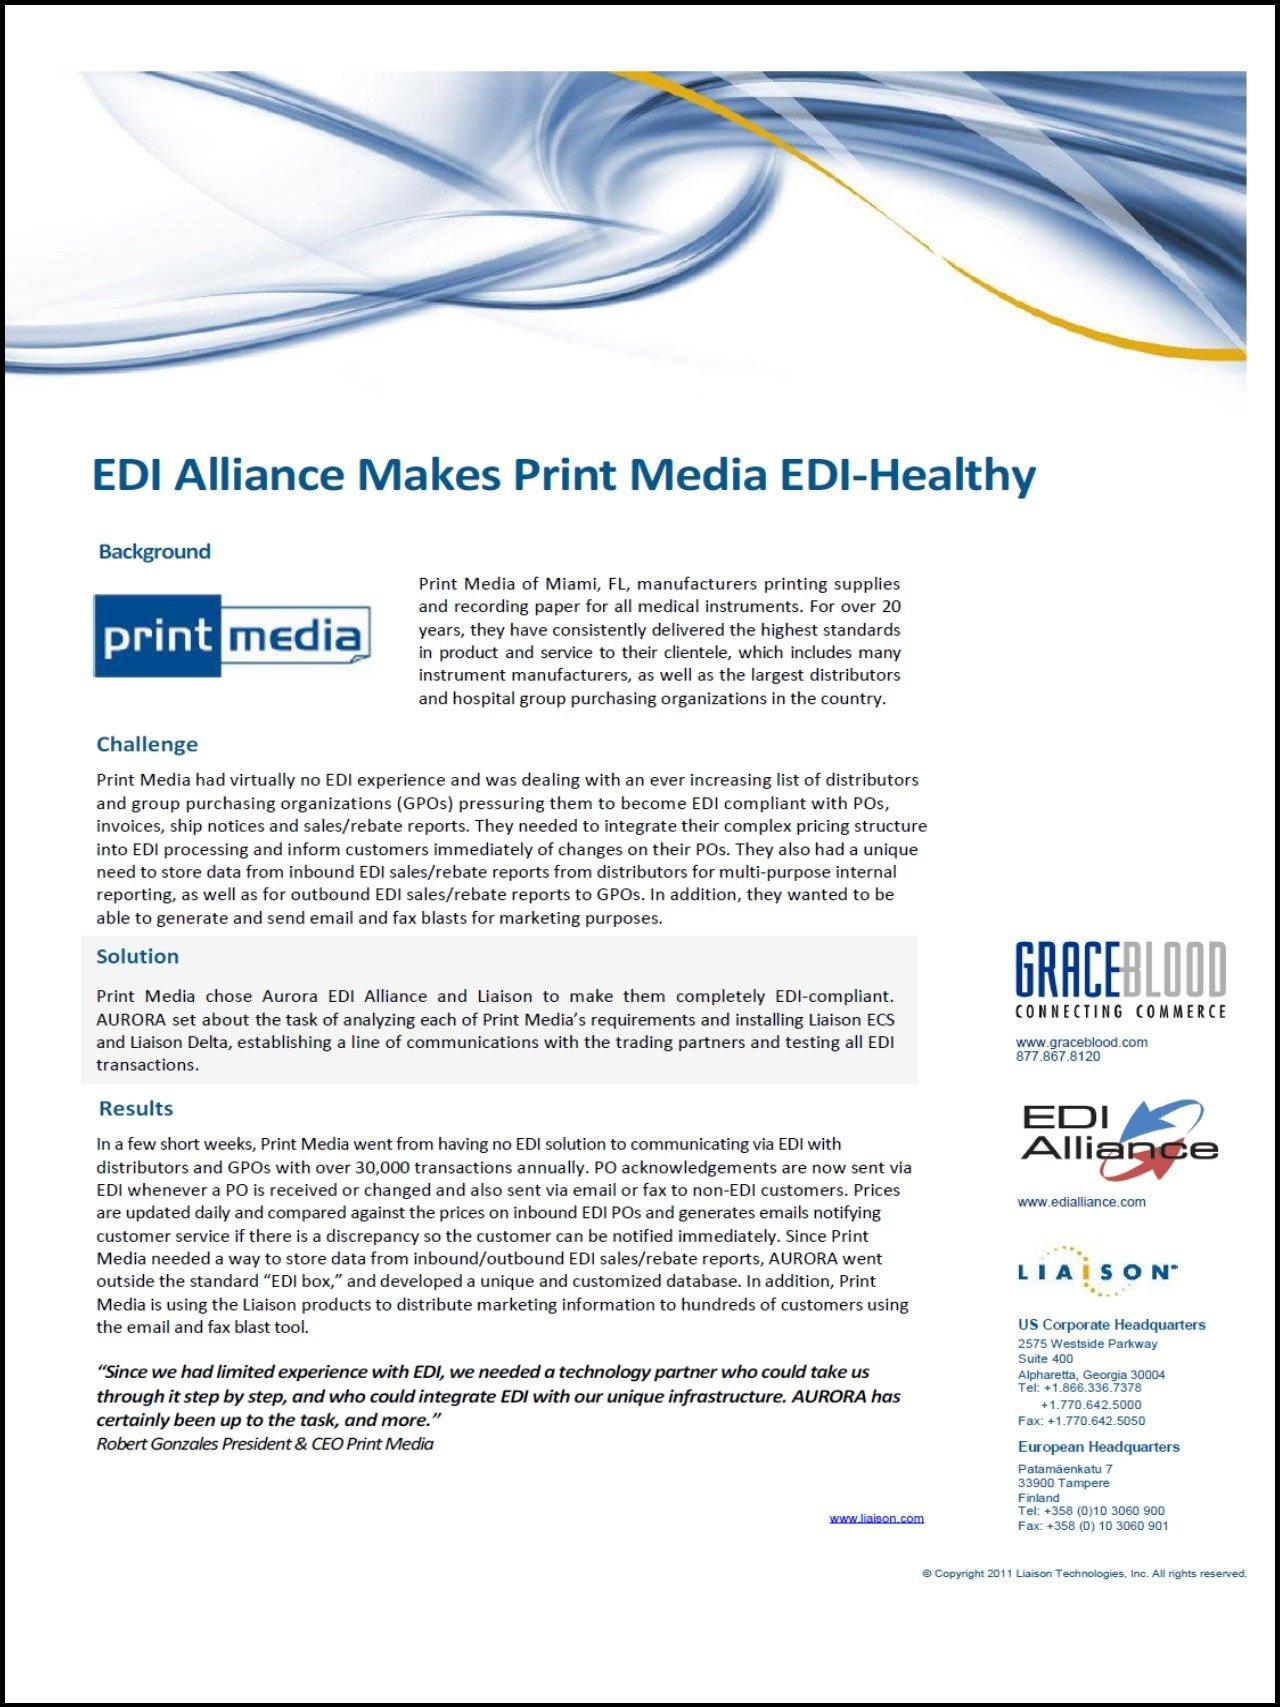 Print Media Image border